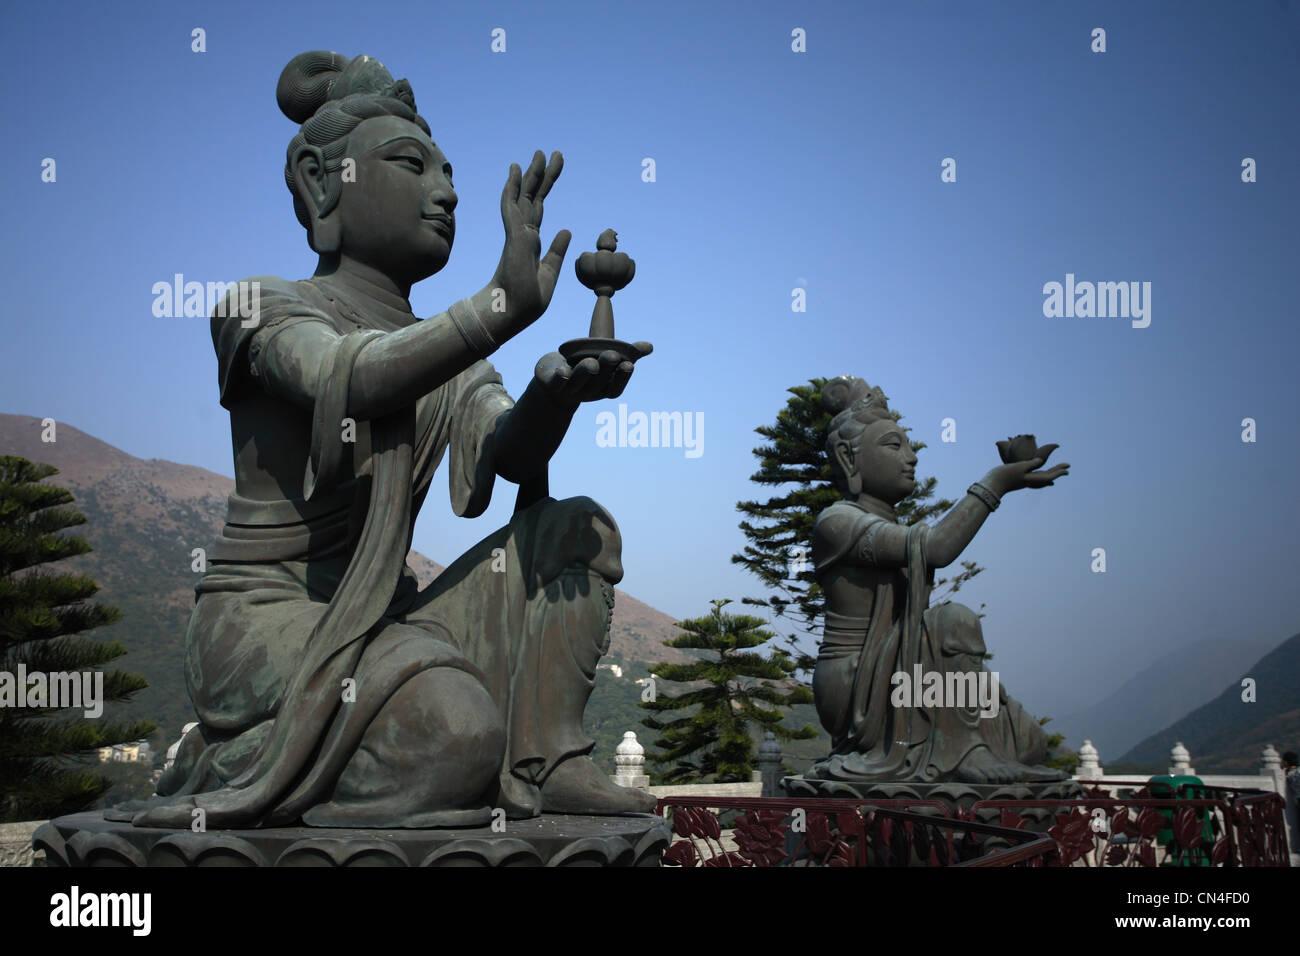 Female Buddhist Sculpture near to the Big Buddha of Lantau Island - Stock Image